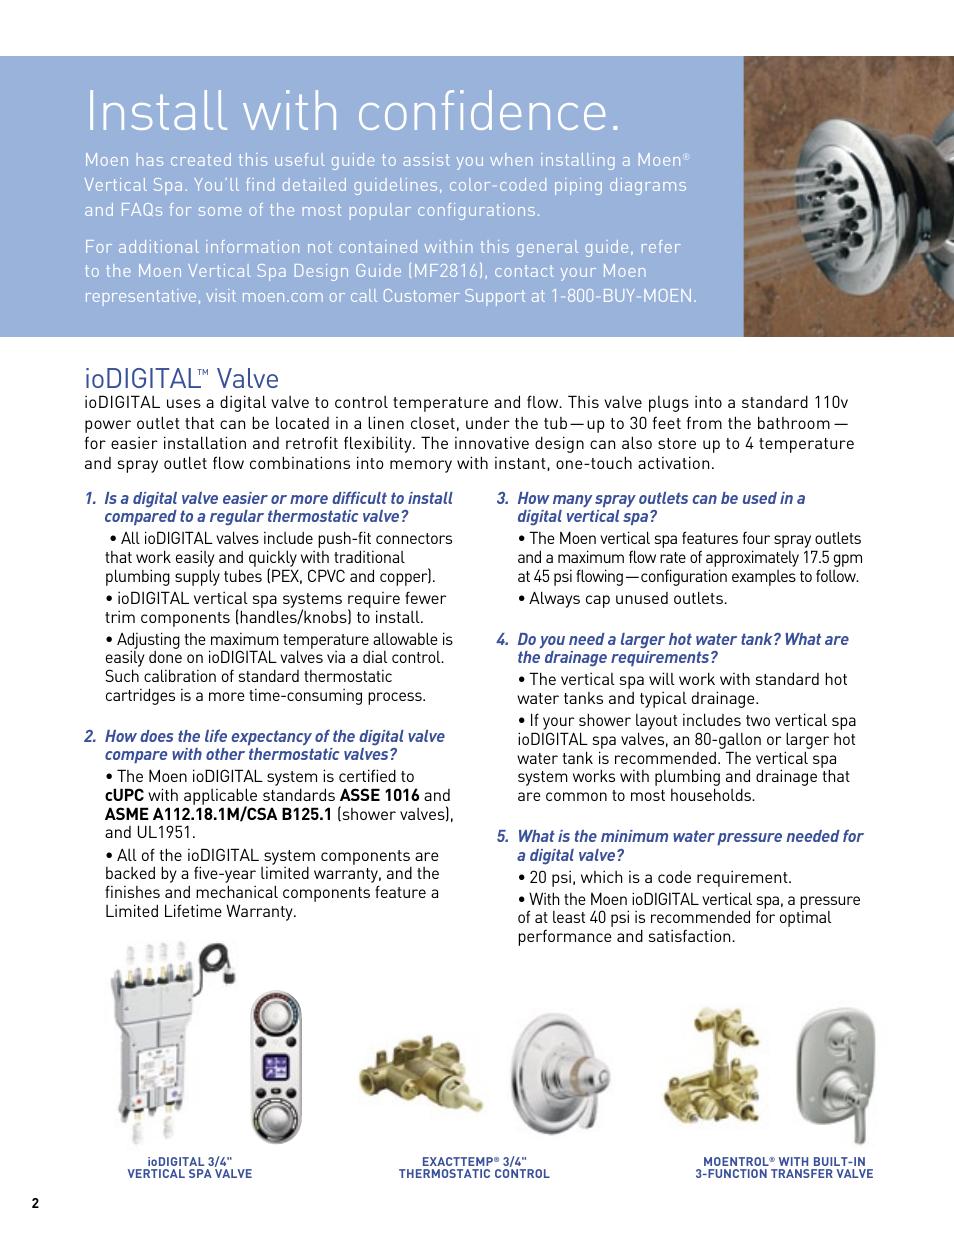 Install With Confidence Iodigital Valve Moen Vertical Spa Mf2816